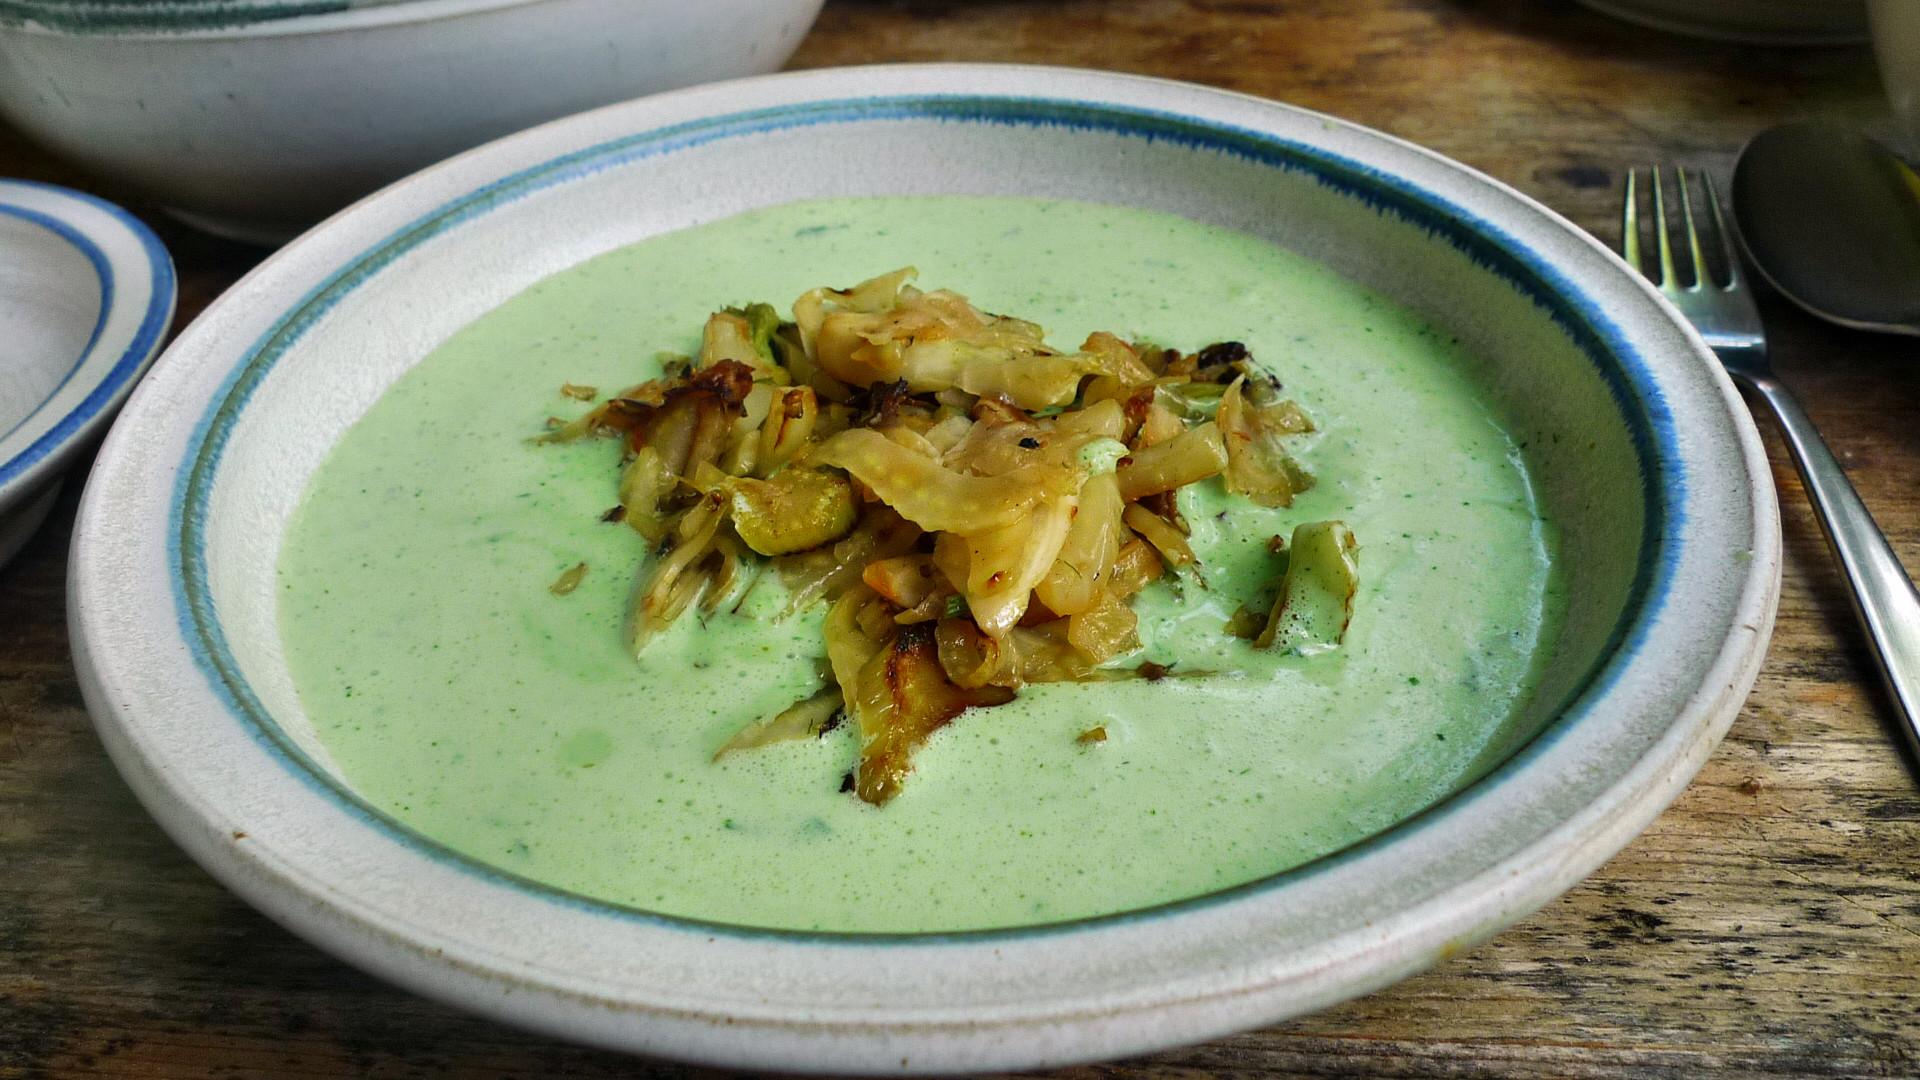 Kalte Kräutersuppe,gebratener Fenchel,Tomatensalat - 4.5.15   (11)